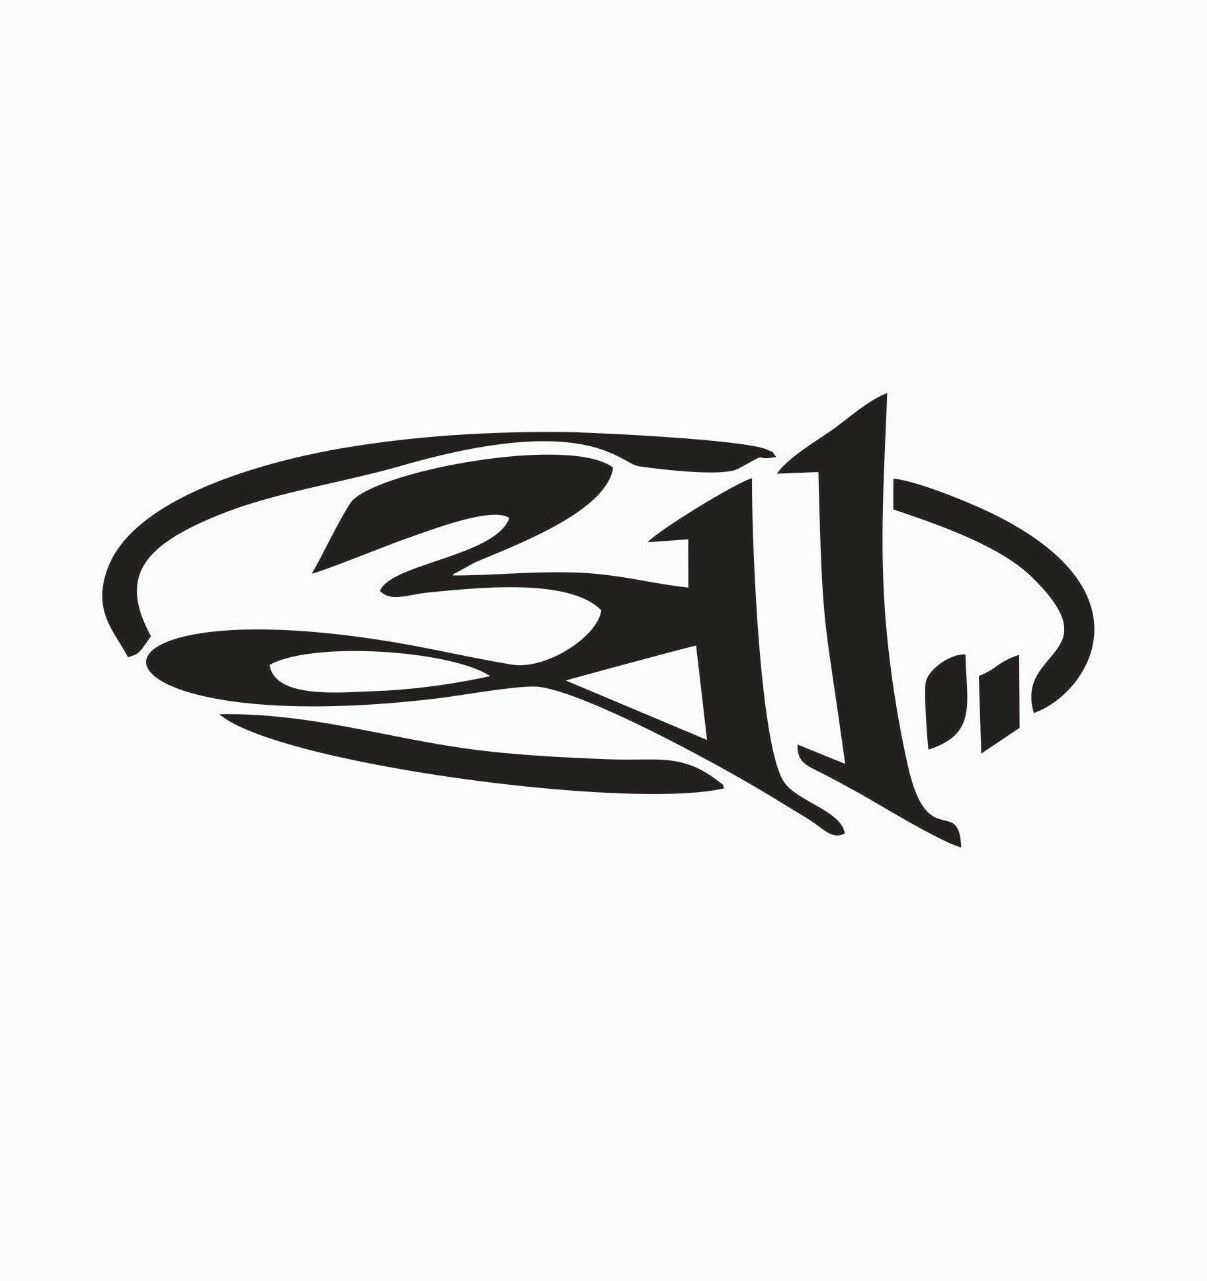 311 Music Band Vinyl Die Cut Car Decal Sticker-FREE SHIPPING